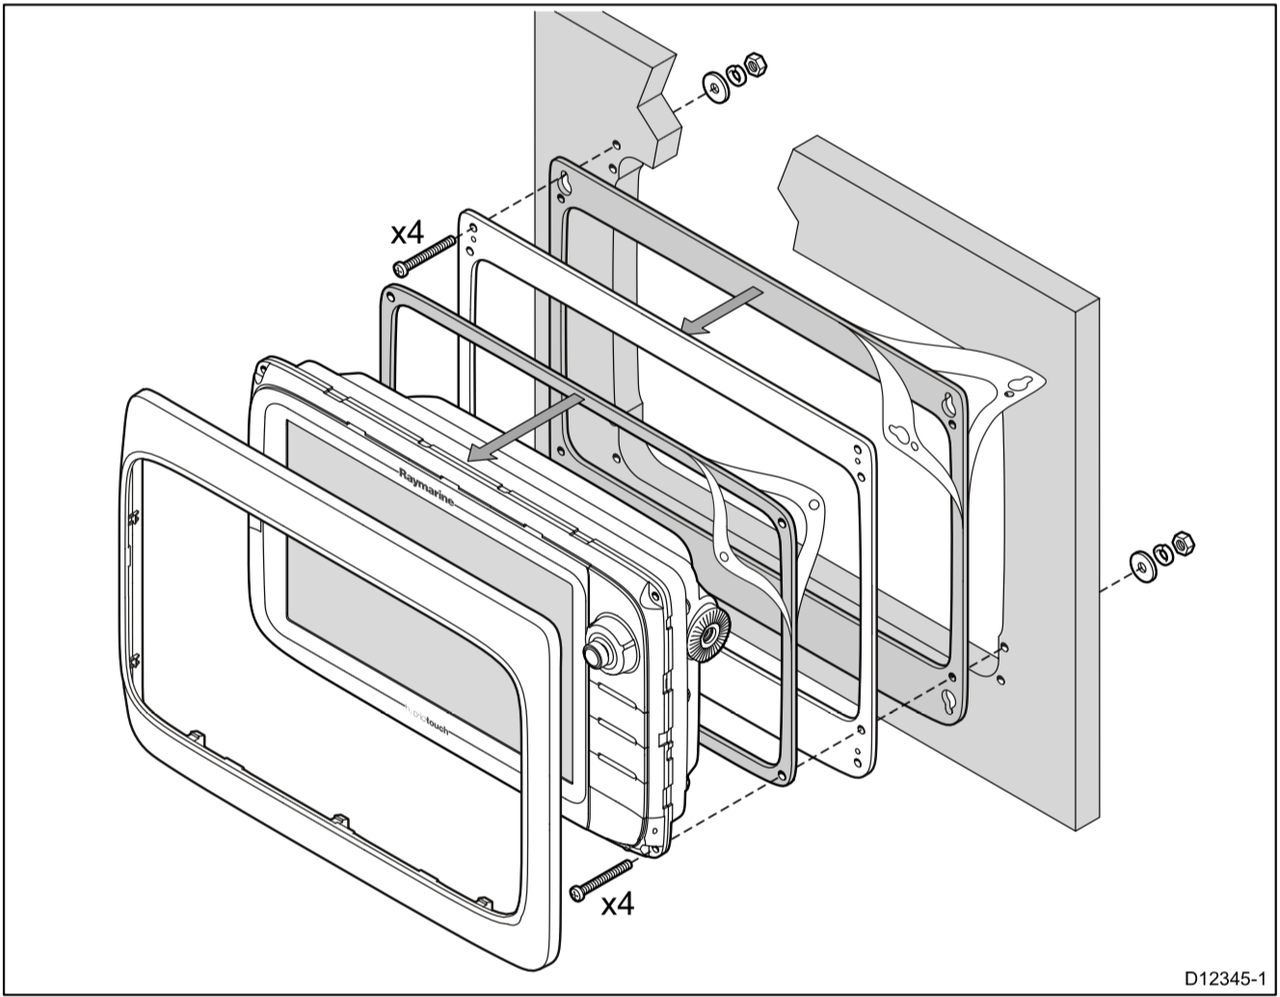 Garmin 498 Wiring Diagram 4 Wire Telephone 17 Gps Diagrams Schematics Bosch Map Sensor